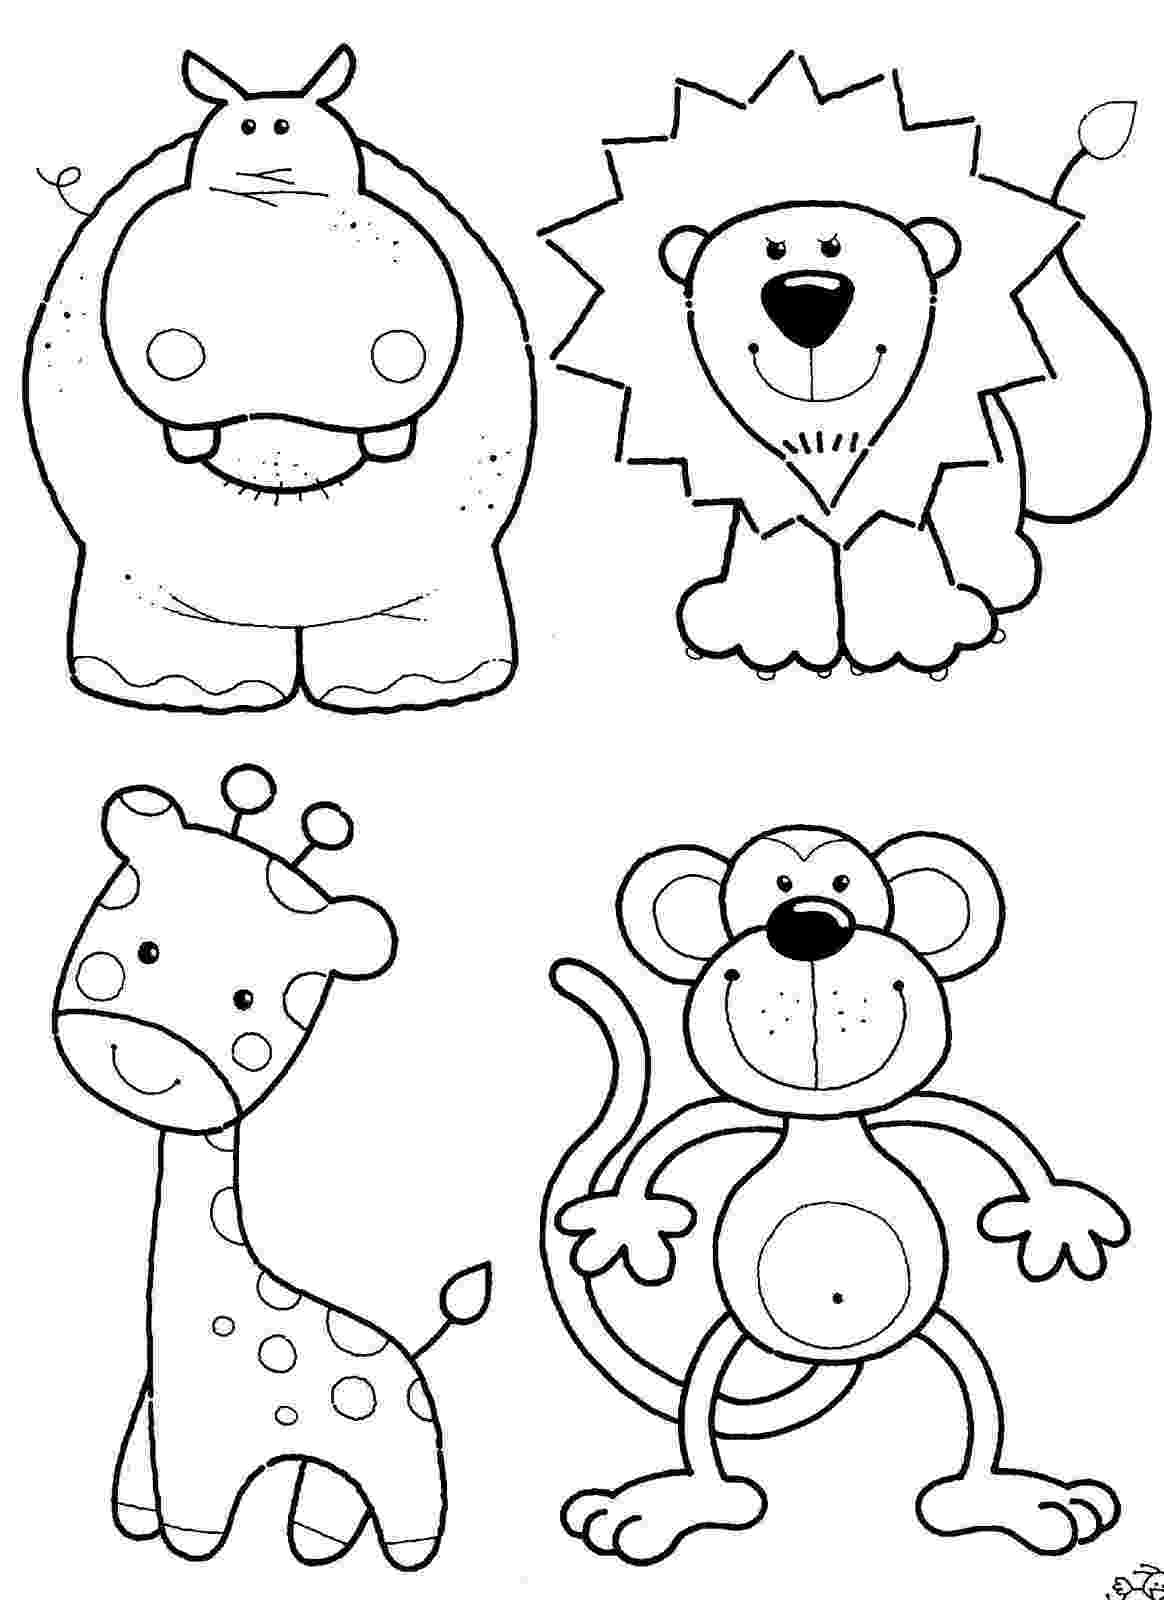 animal coloring sheets coloring ville animal sheets coloring